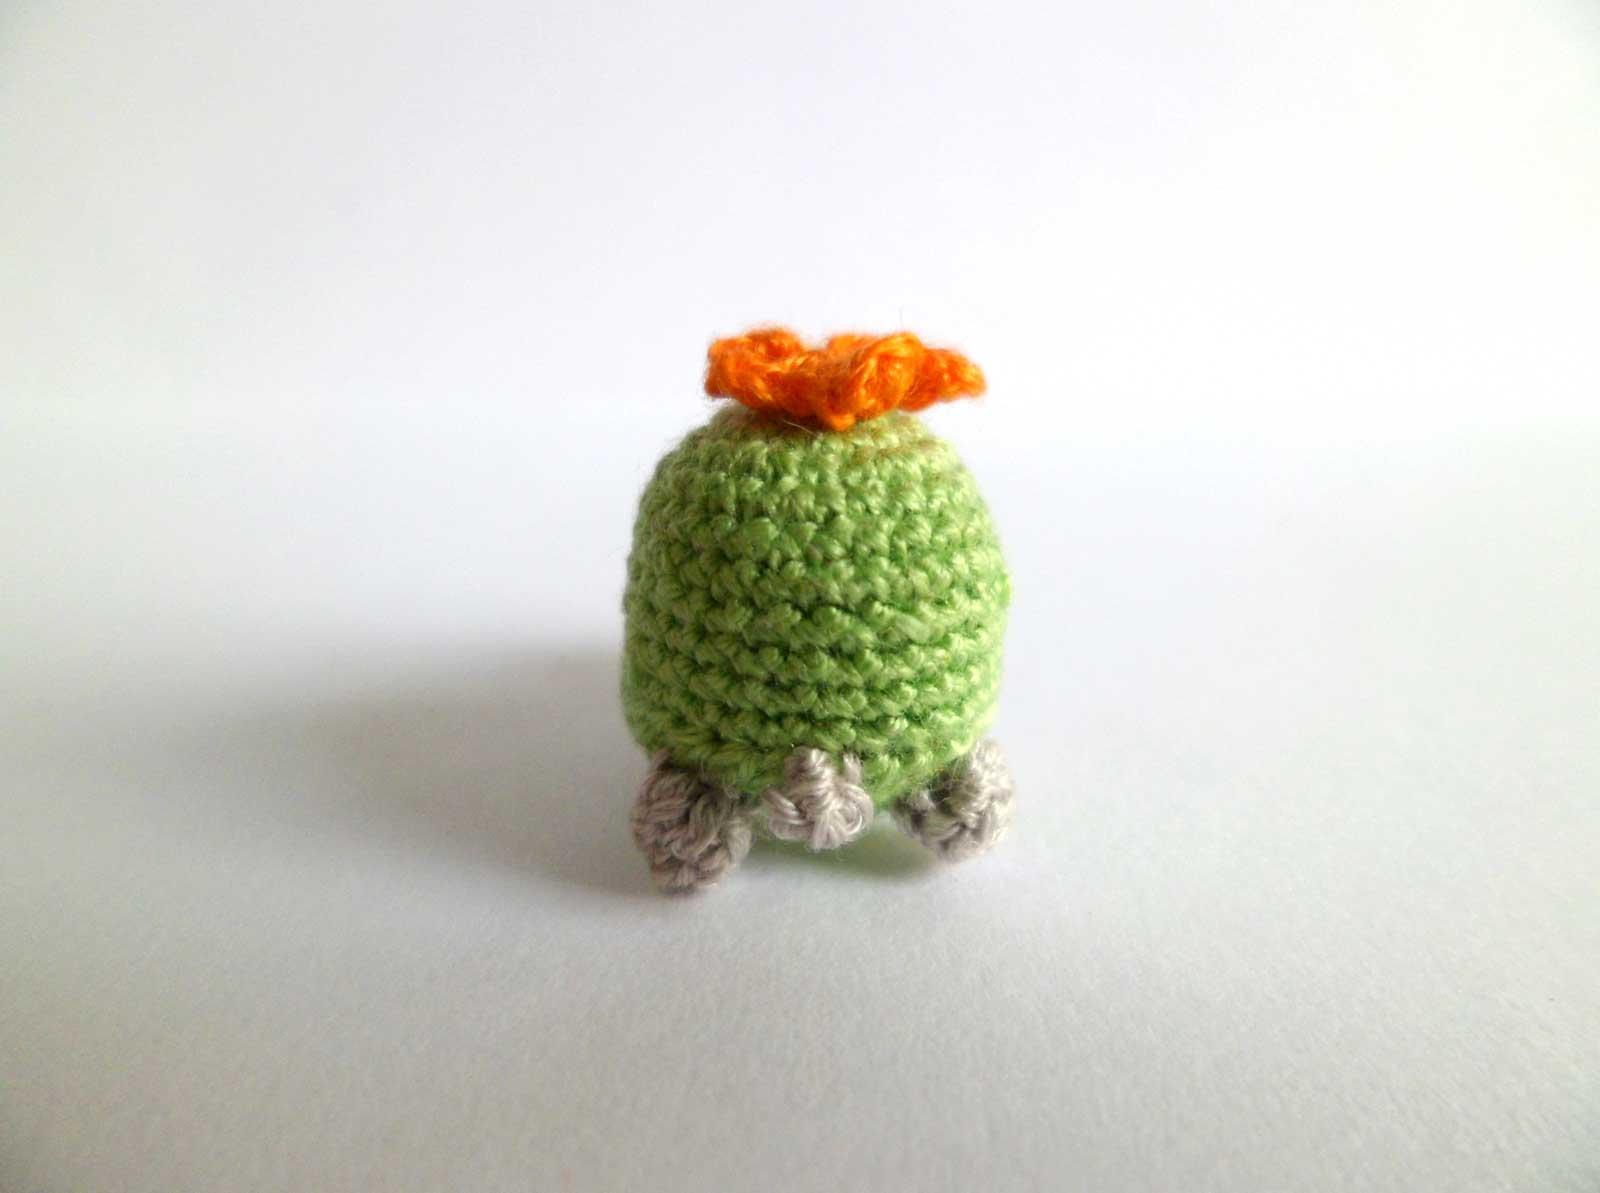 how to make miniature crochet animals